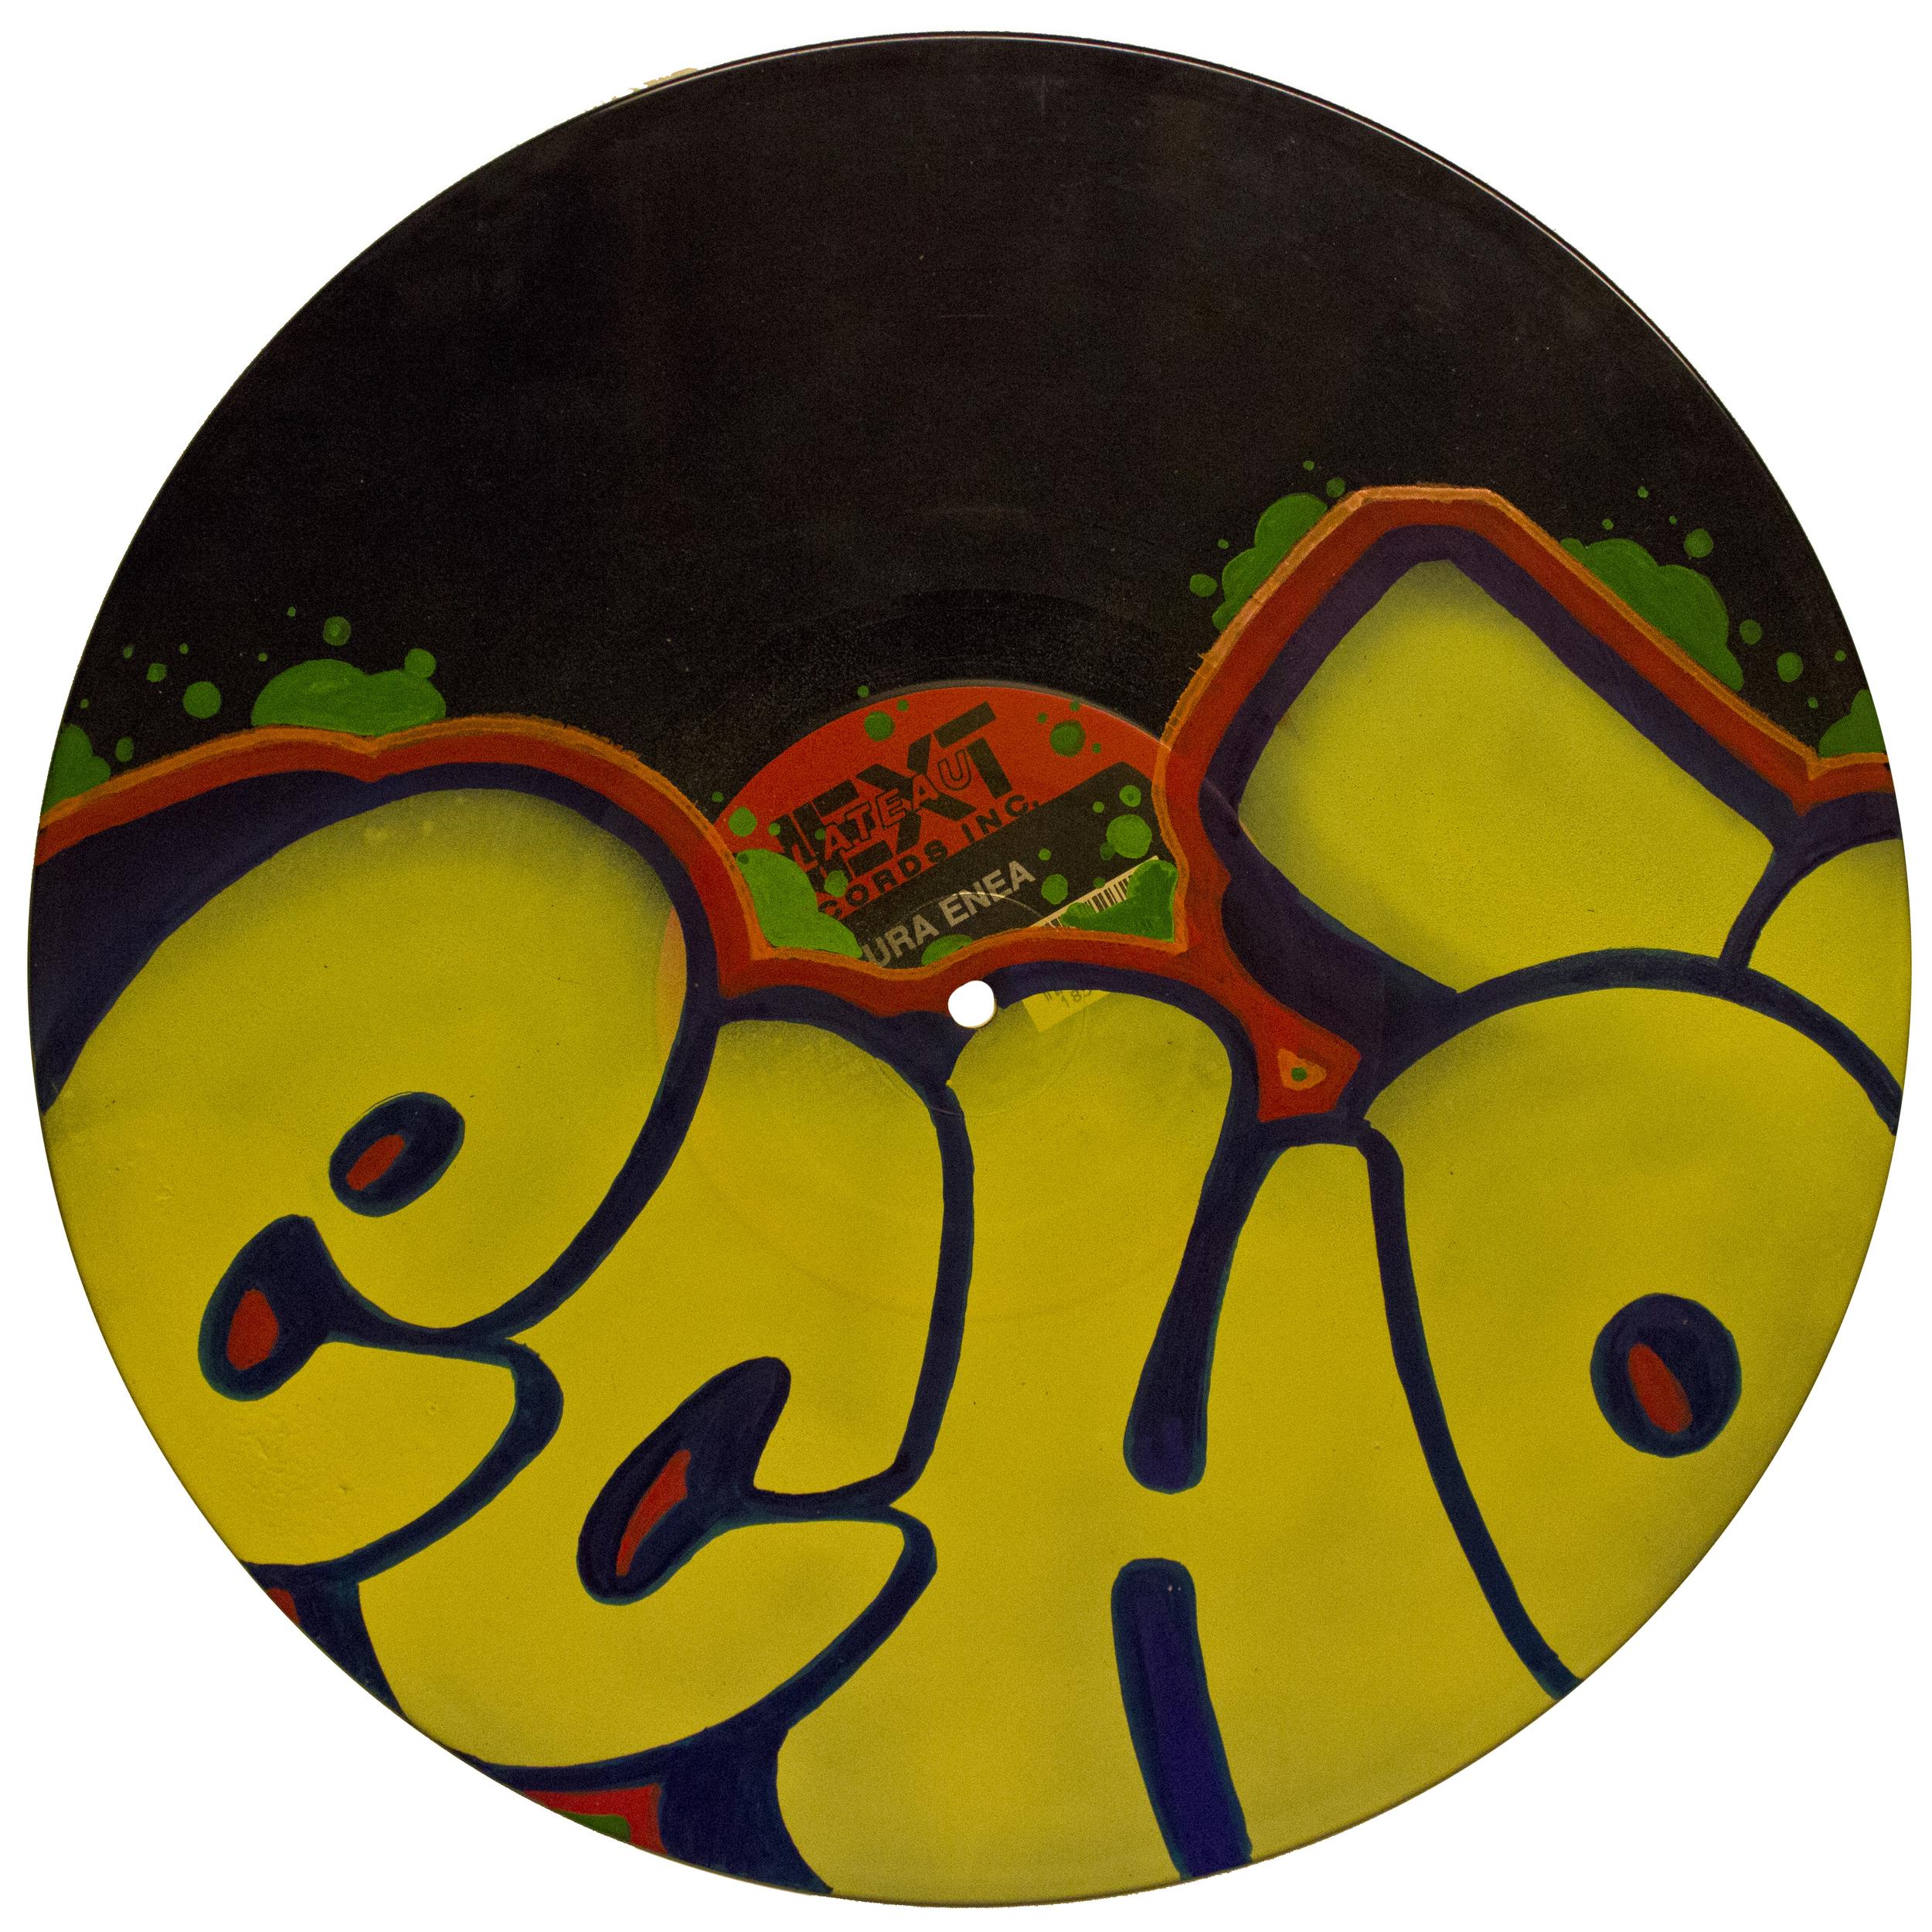 ECHO 30.jpg